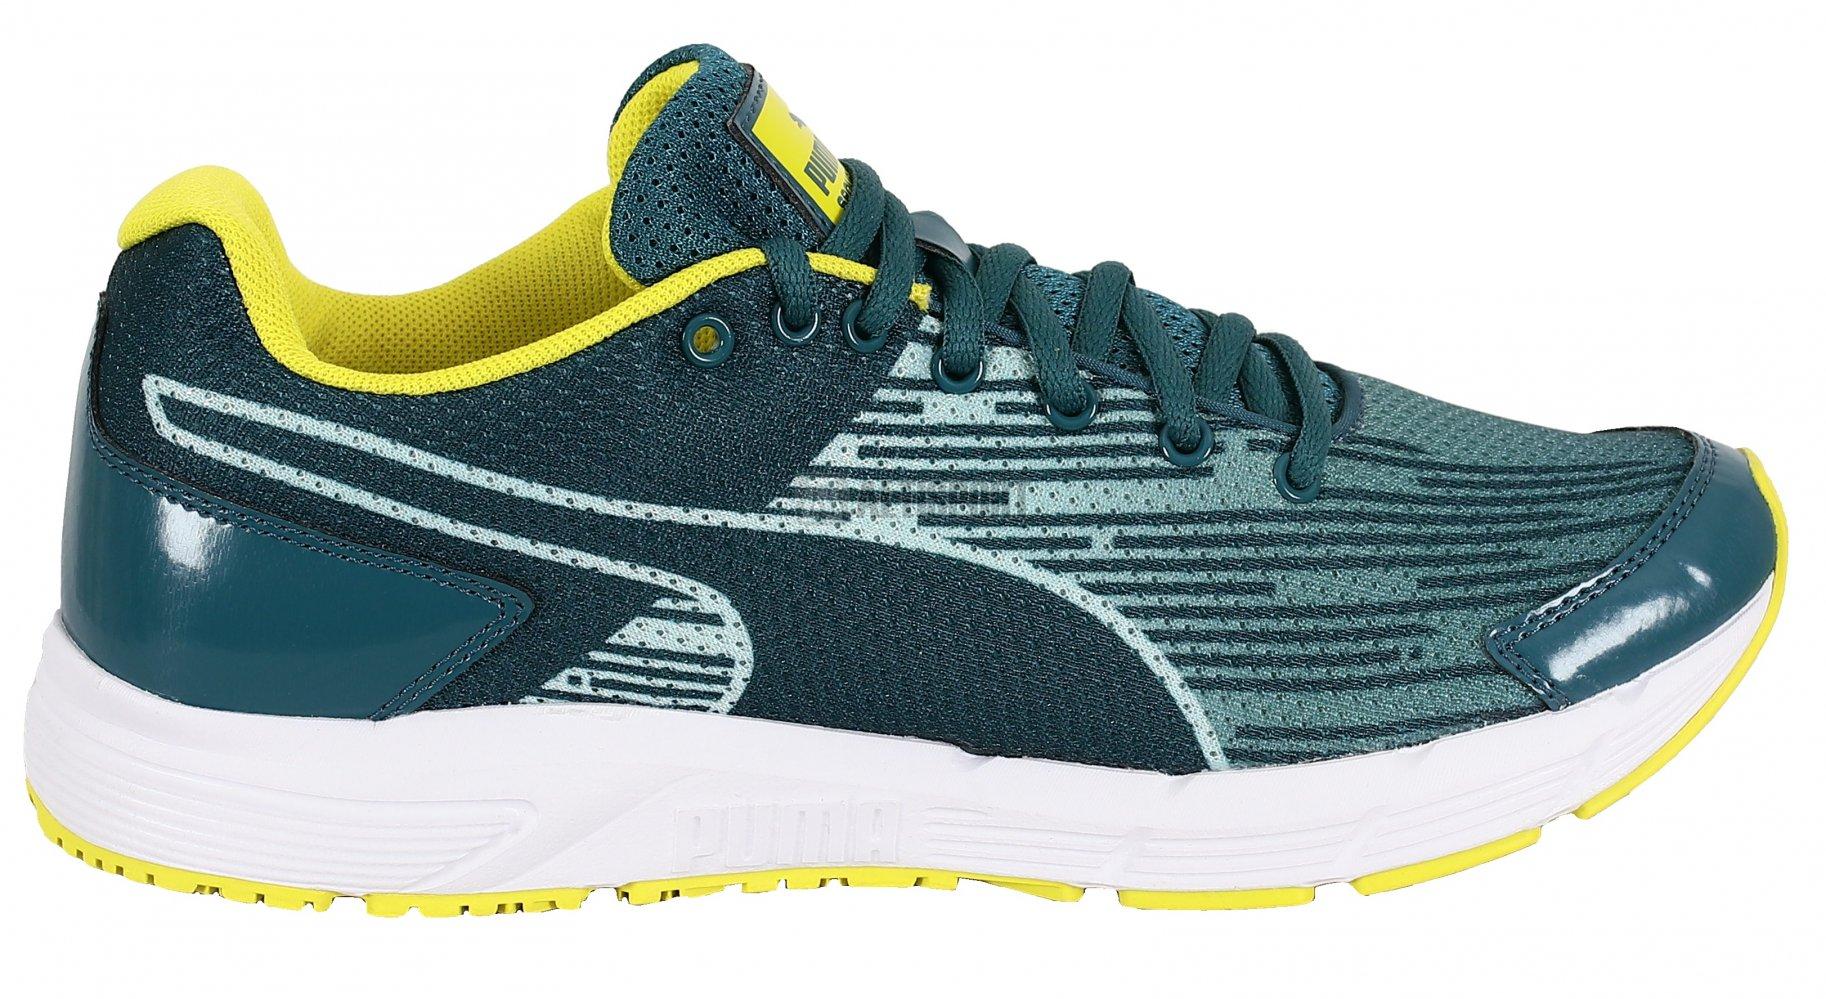 Dámská běžecká obuv PUMA SEQUENCE WN S 18756008 MODRÁ velikost  35 b36c68a073